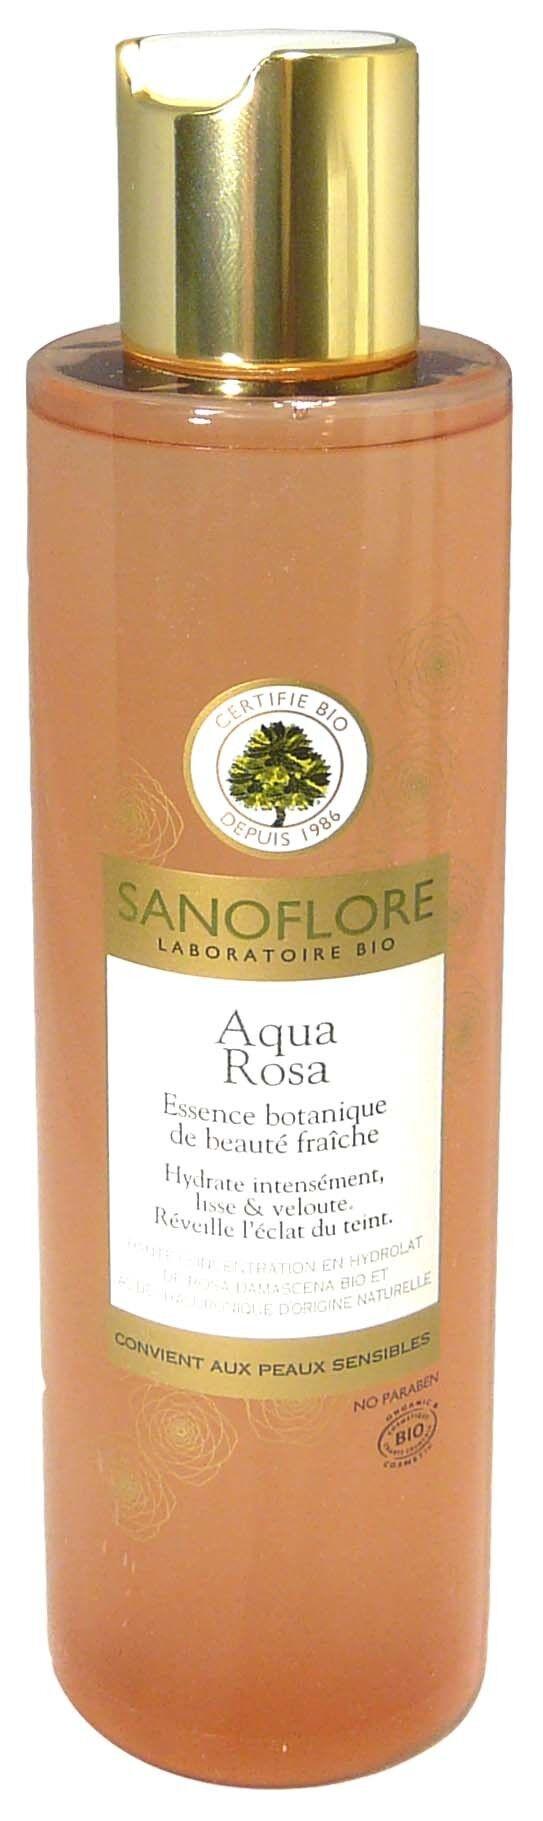 Sanoflore aqua rosa 200ml